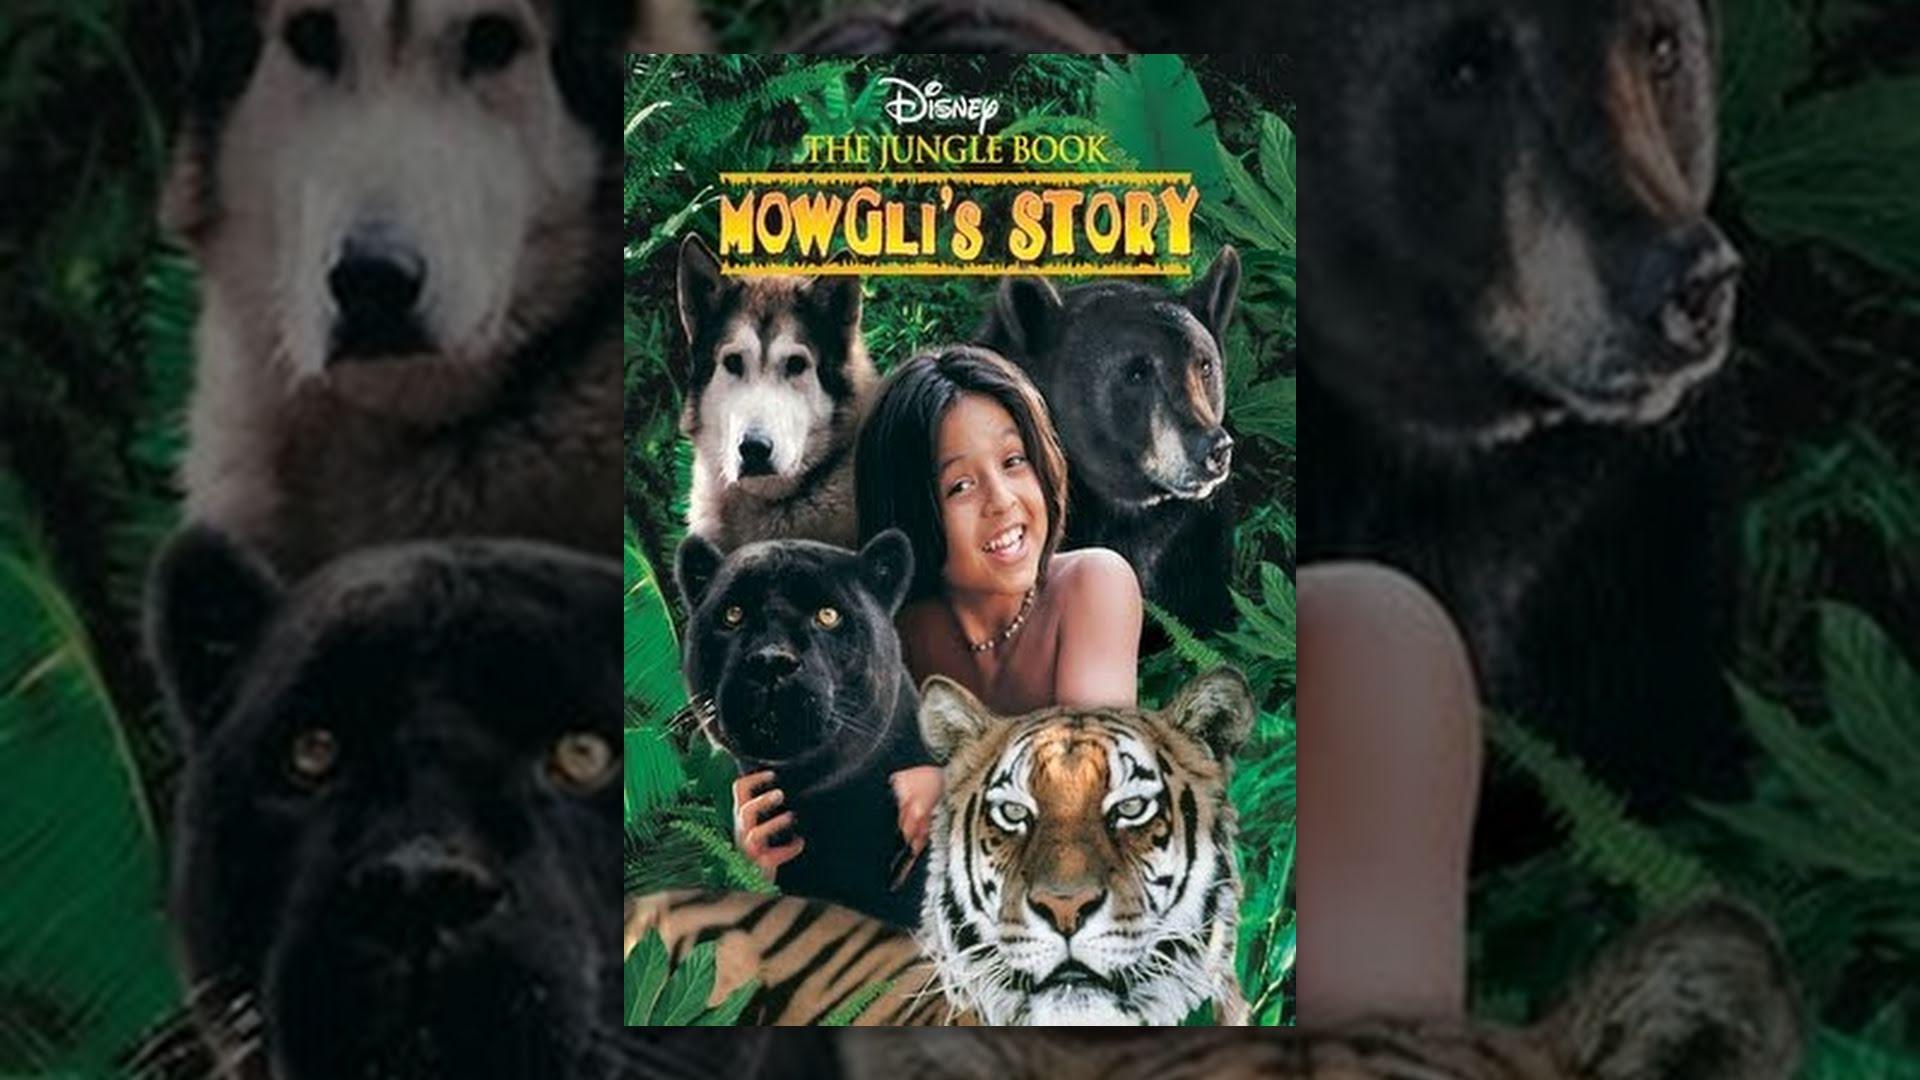 Mowgli's Story